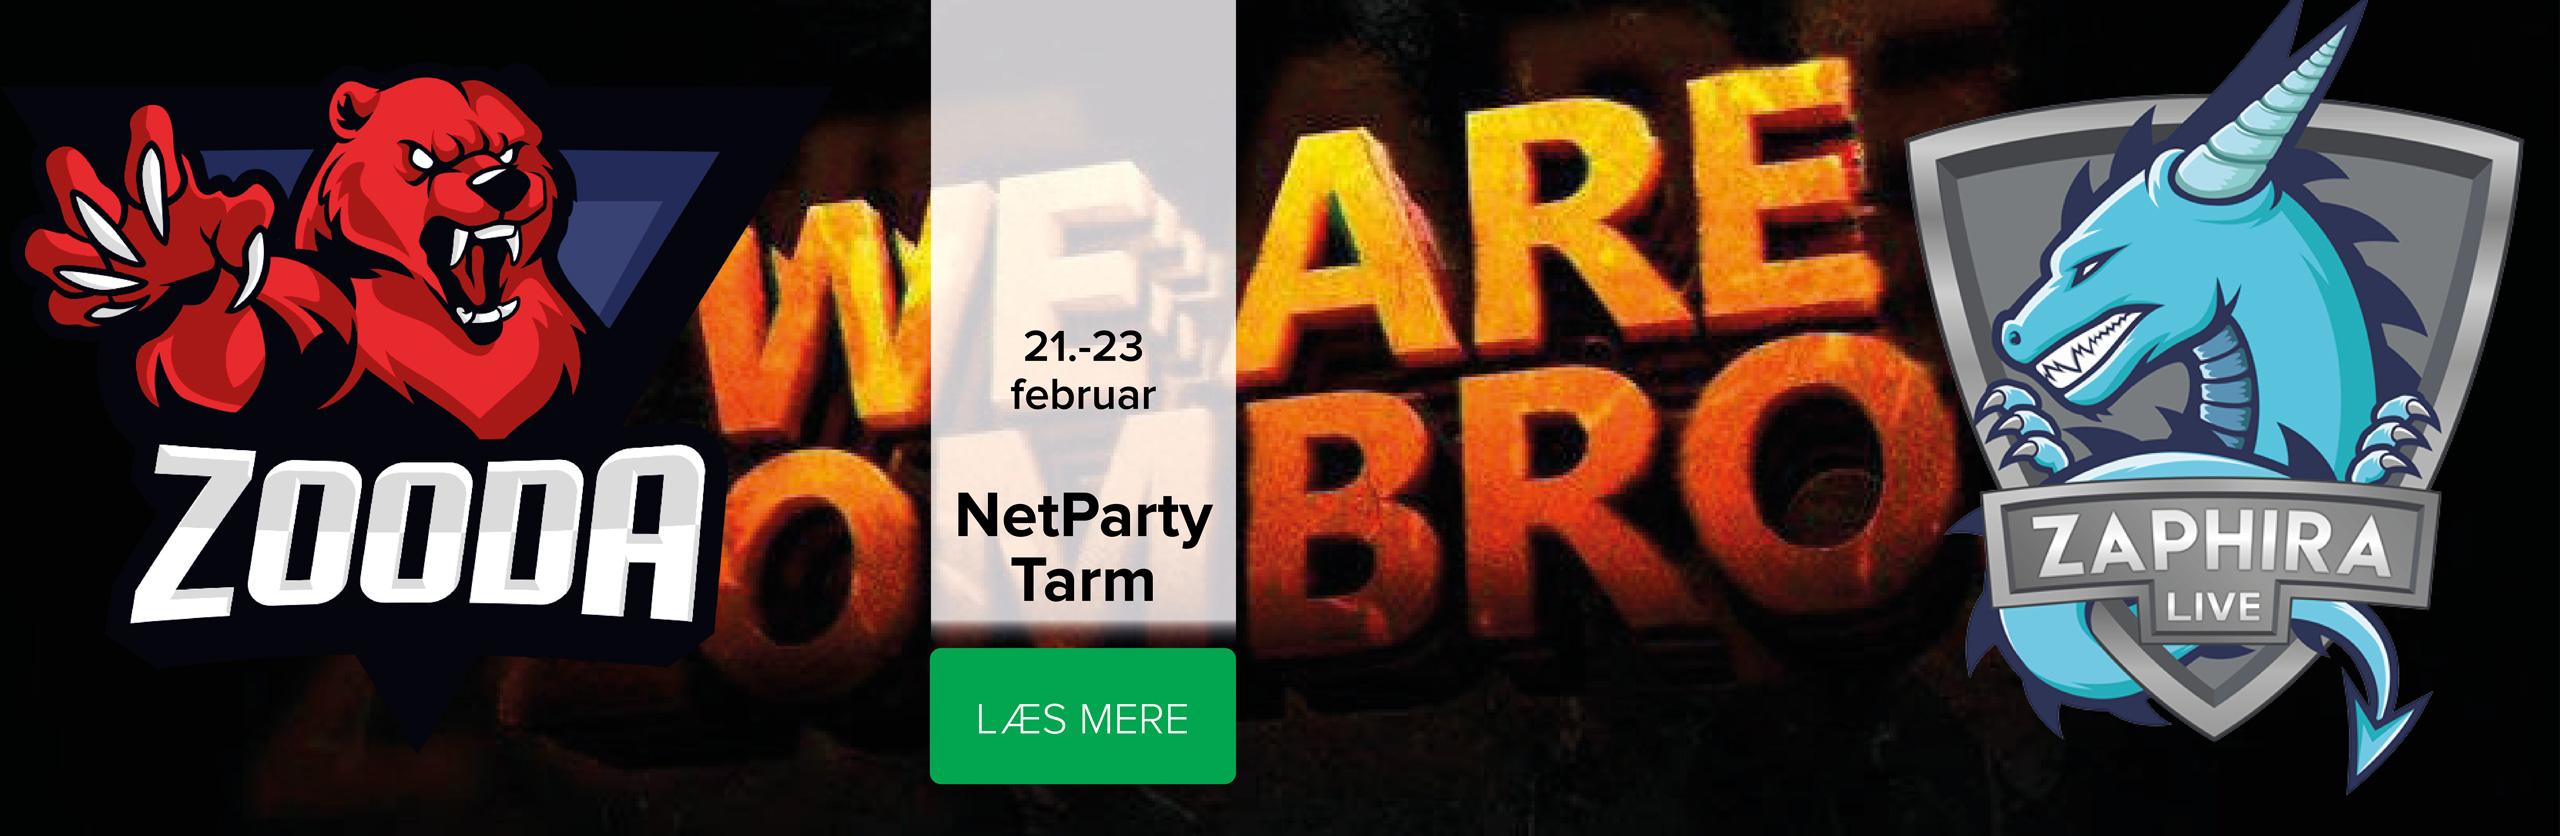 NetParty Tarm